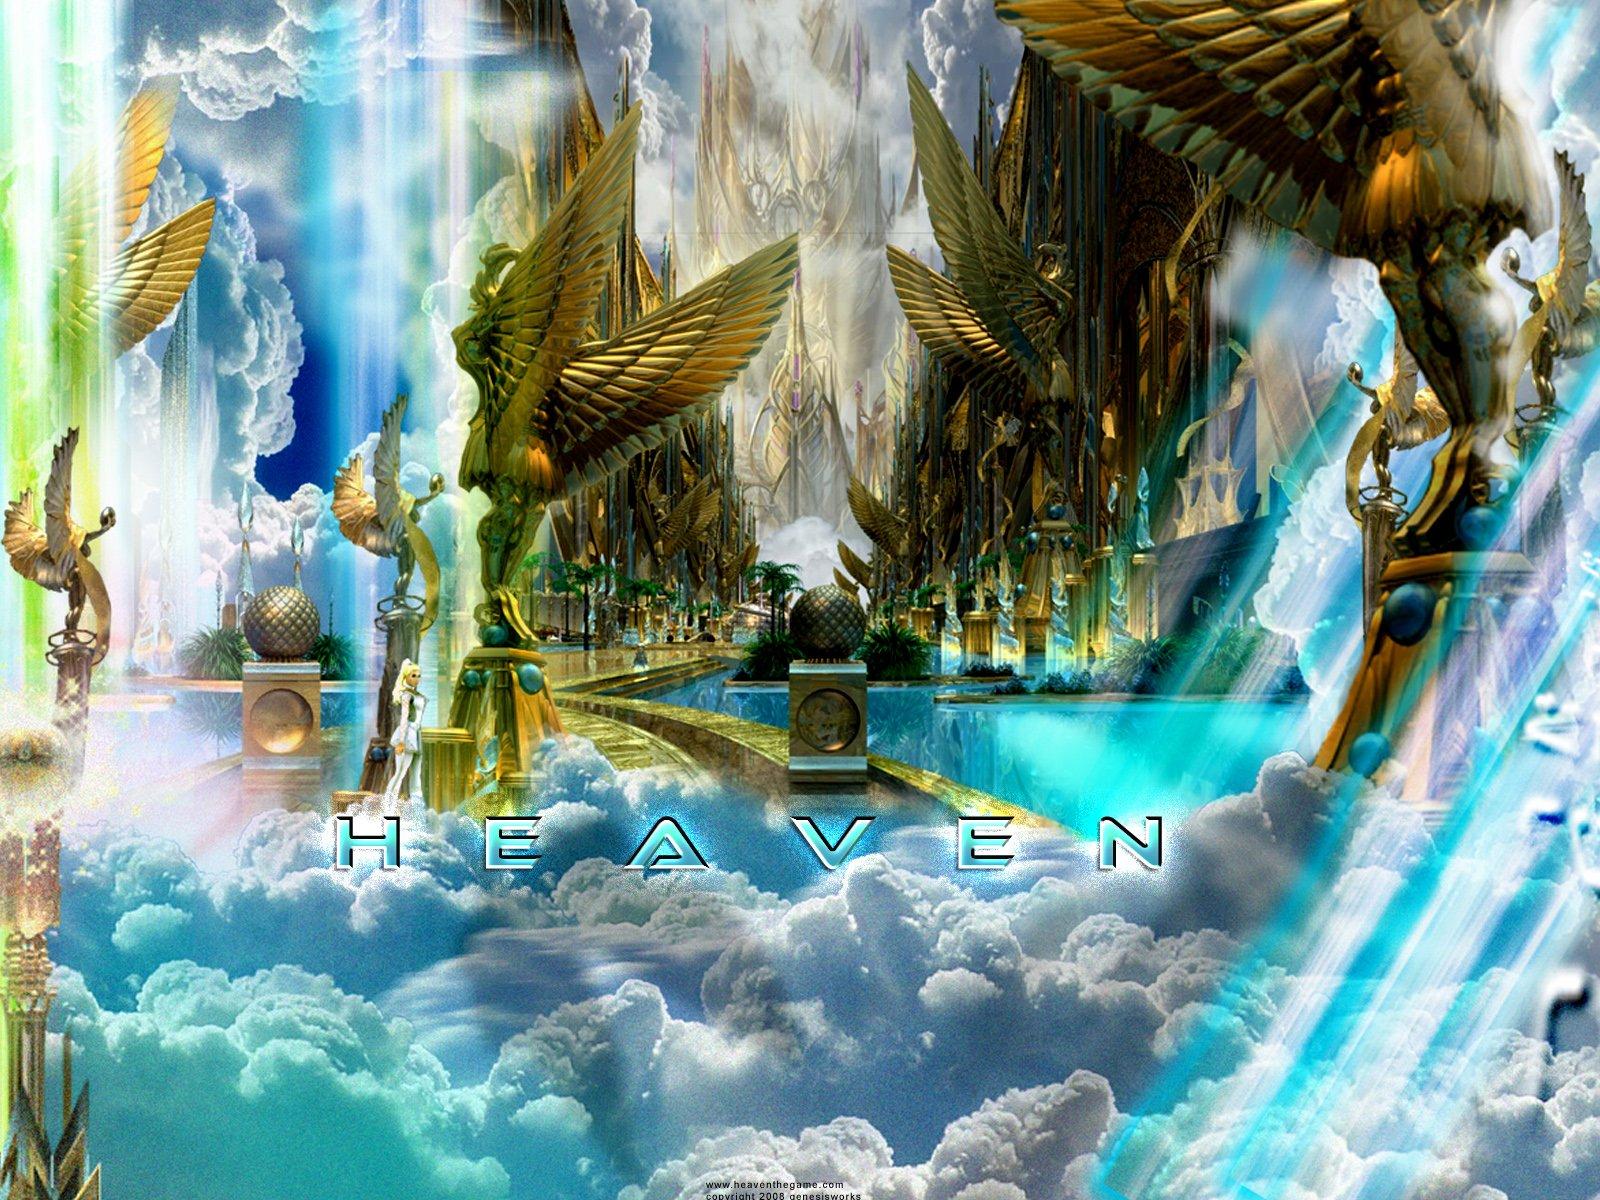 heaven backgrounds screensavers wallpaper - photo #38